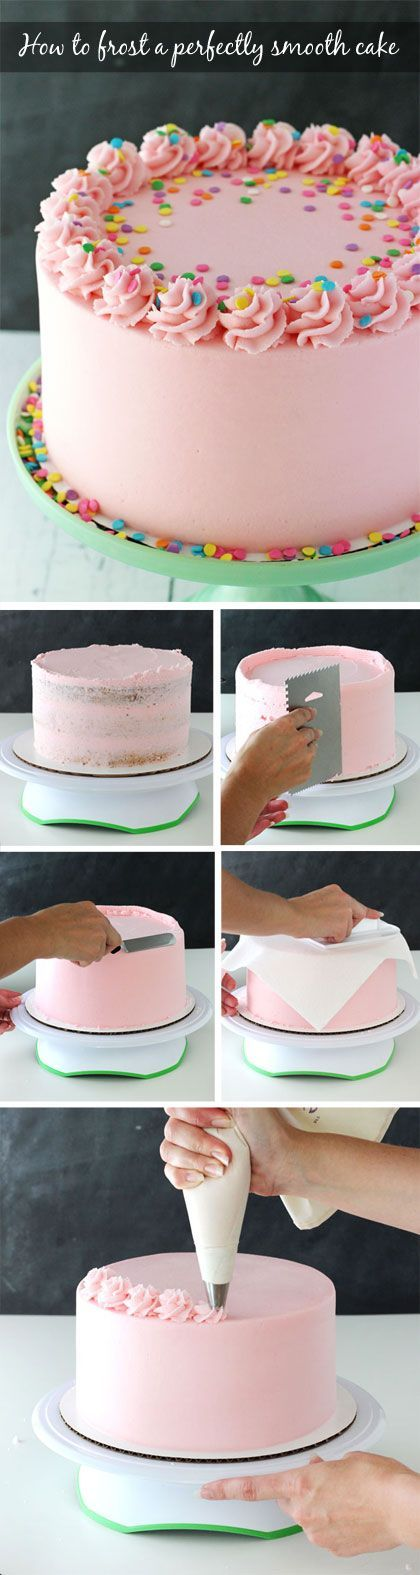 Crescere e Sognare: Pinterest Sweet Dessert Page ;)